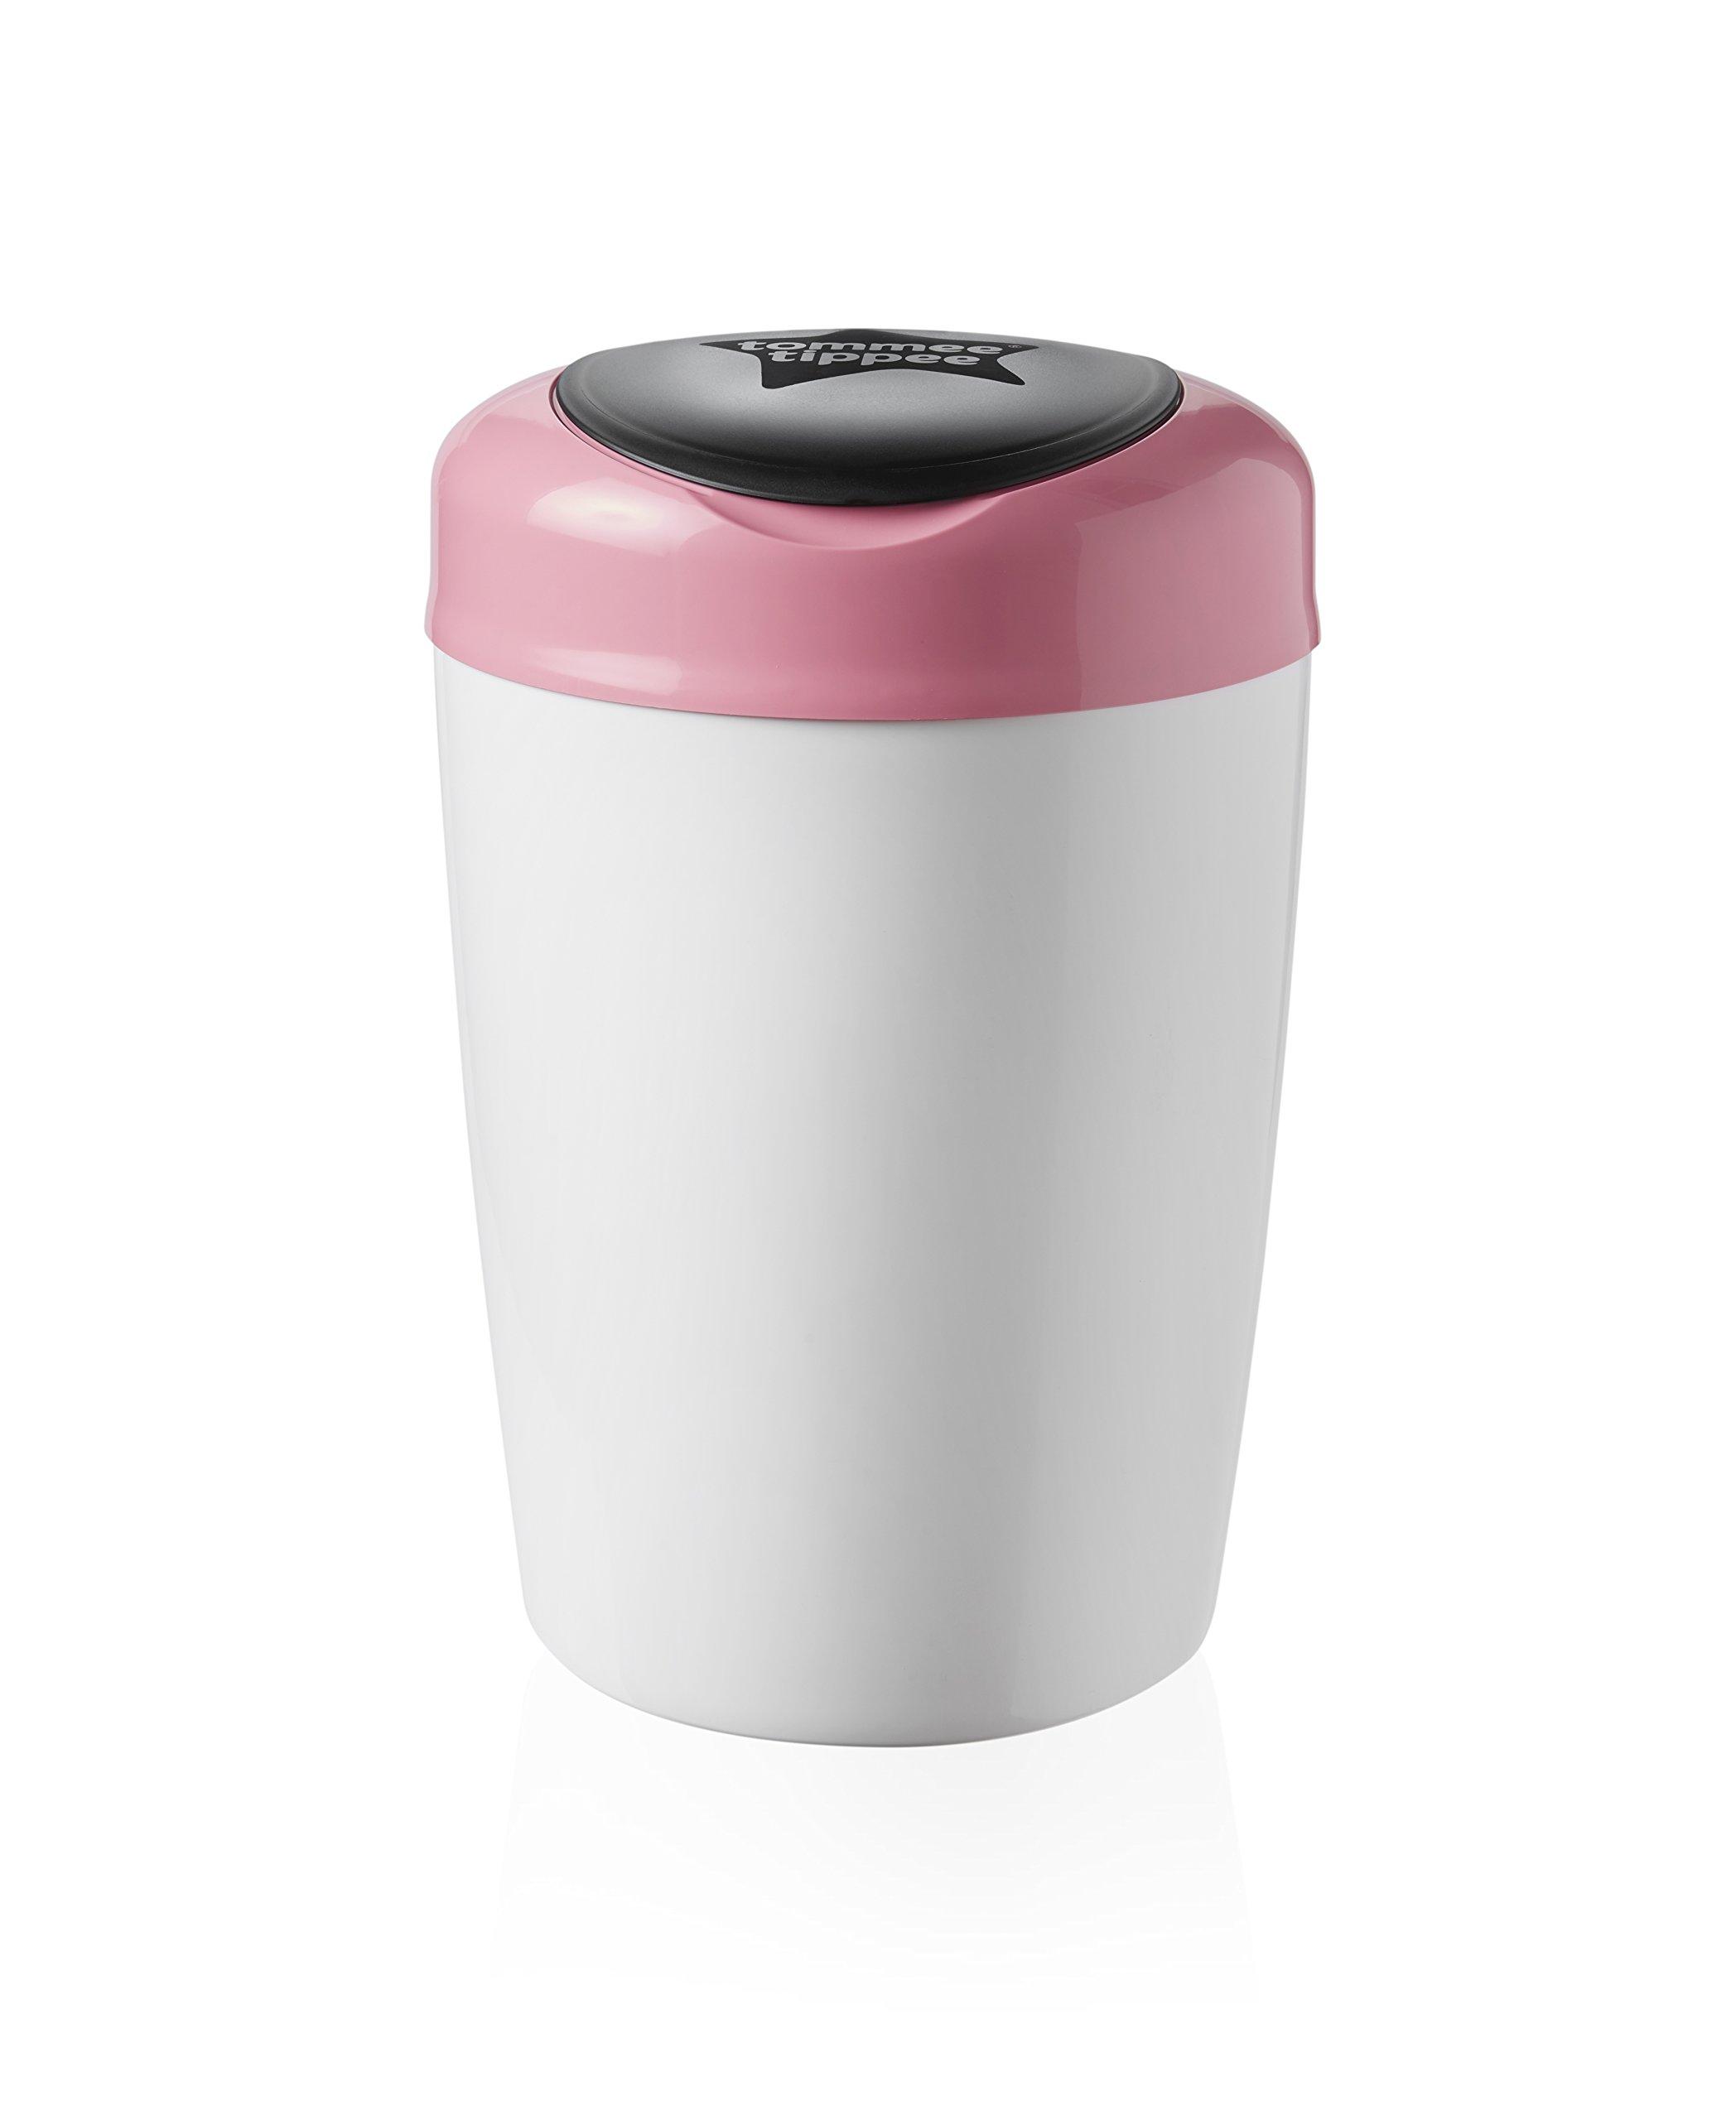 Tommee Tippee Simplee Sangenic Cubo de basura para pañales blanco roto rosa product image